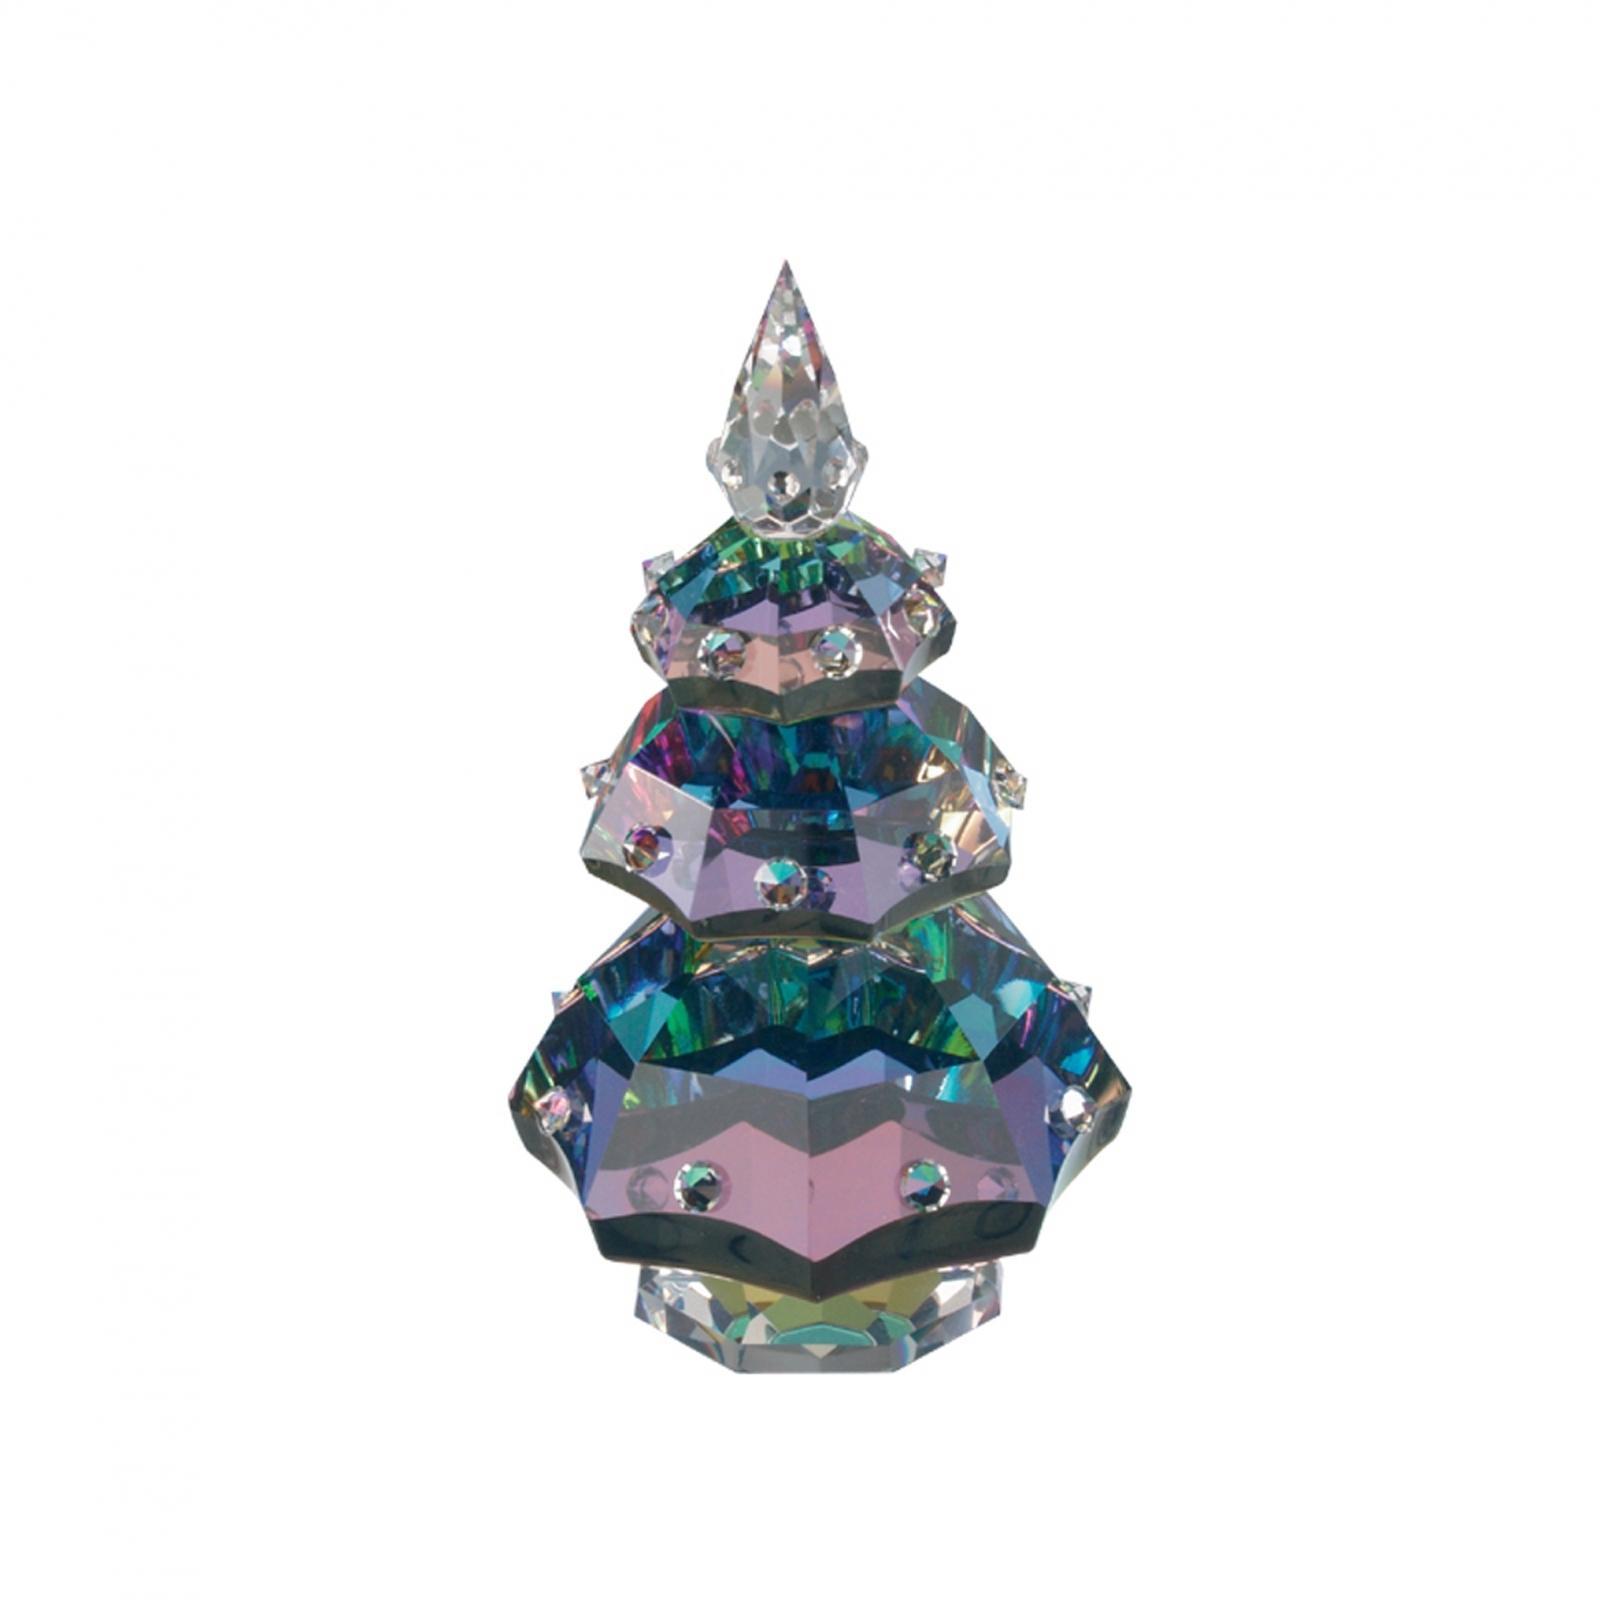 Figurina cristal Preciosa - Christmas Tree (Vitrail Light)